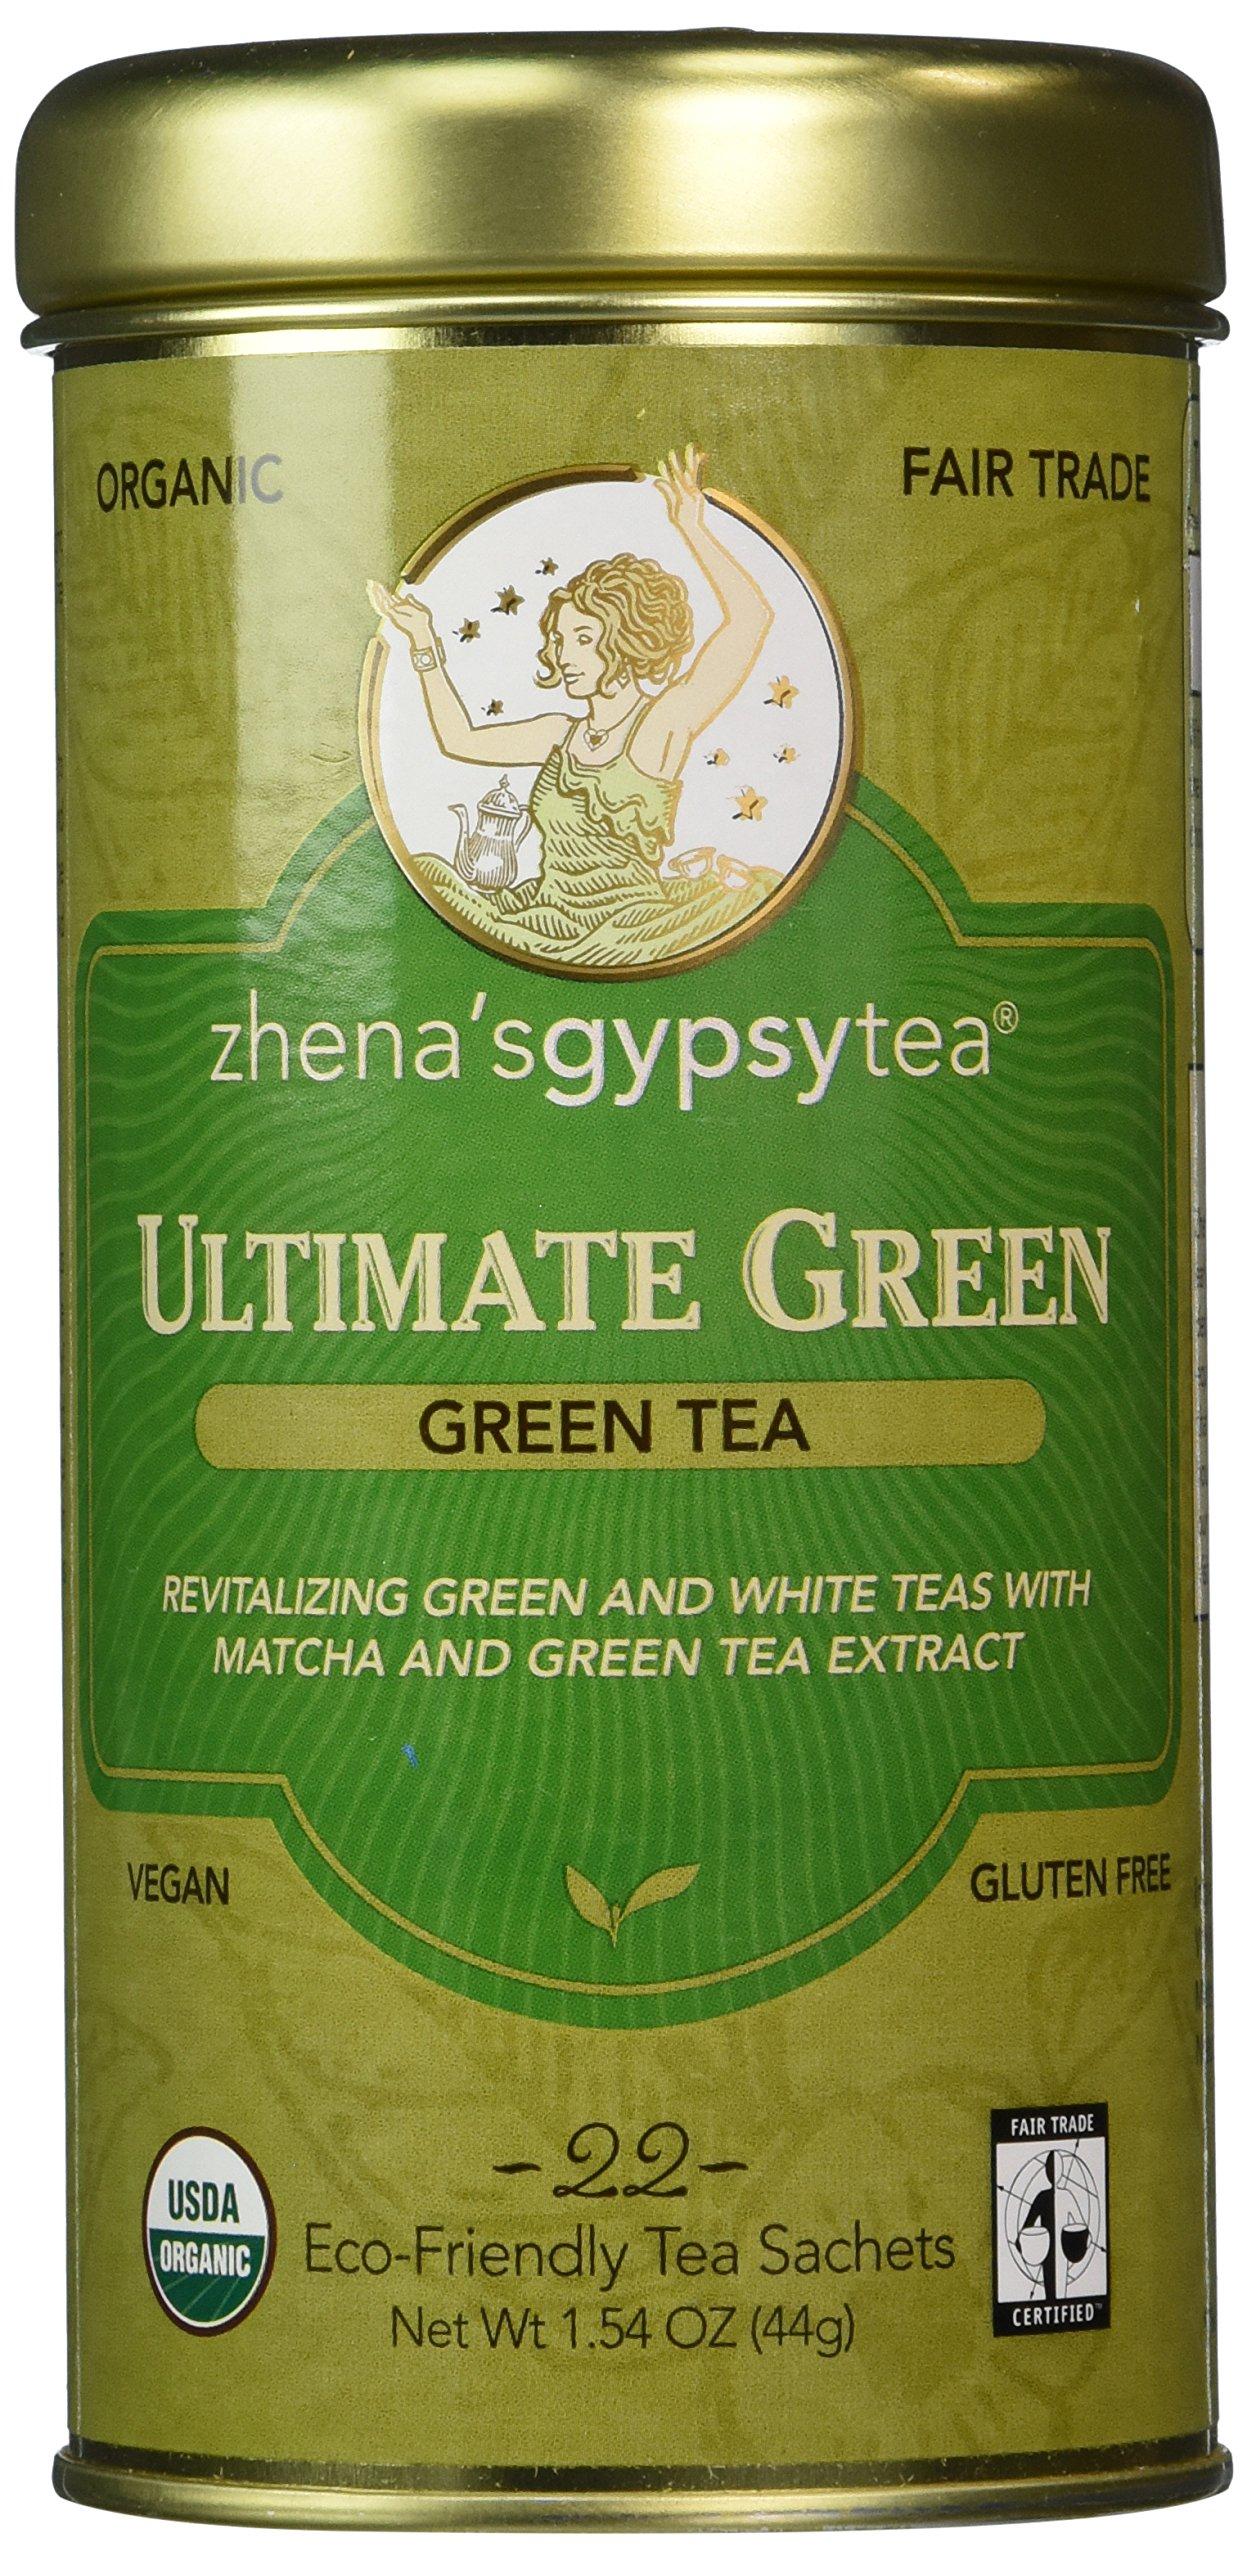 Zhena's Gypsy Tea, Ultimate Green, Green Tea, 22 Count Tea Sachet